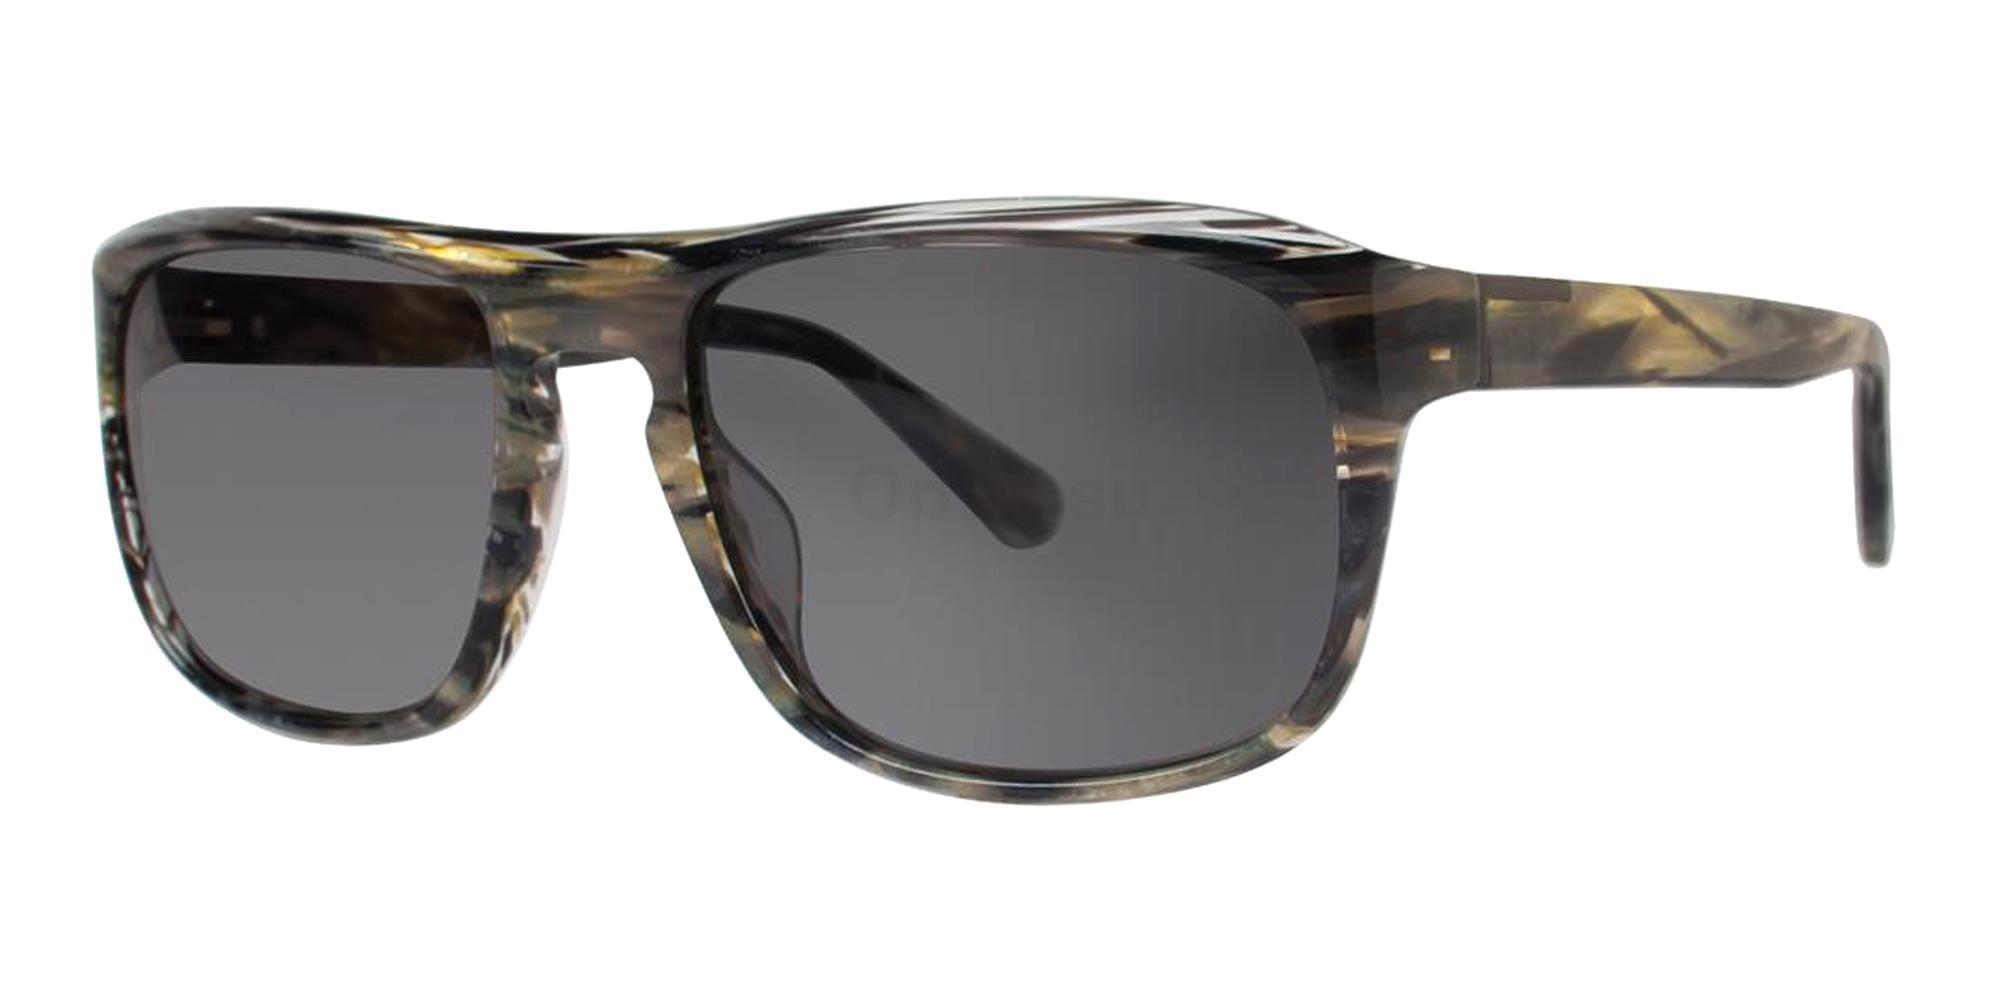 Green Horn CAIN Sunglasses, Zac Posen